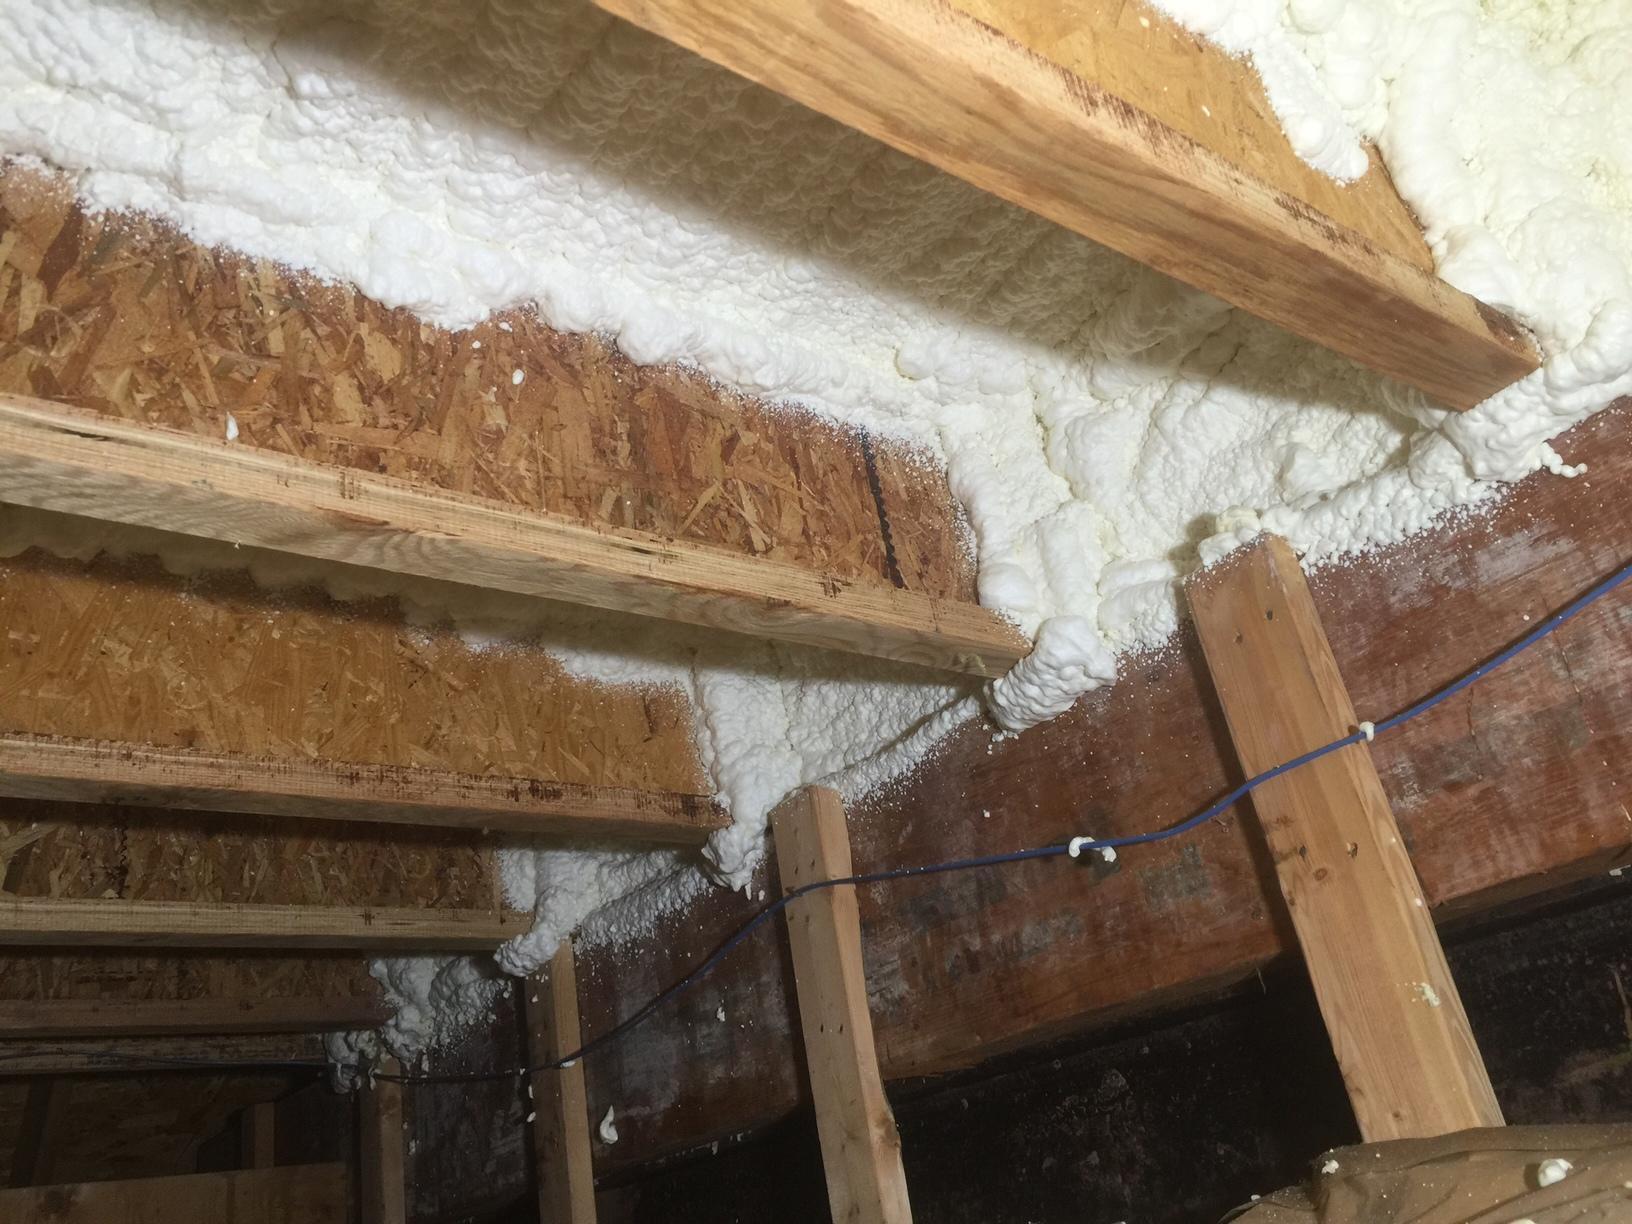 Garage Insulation in Sterling VA - After Photo